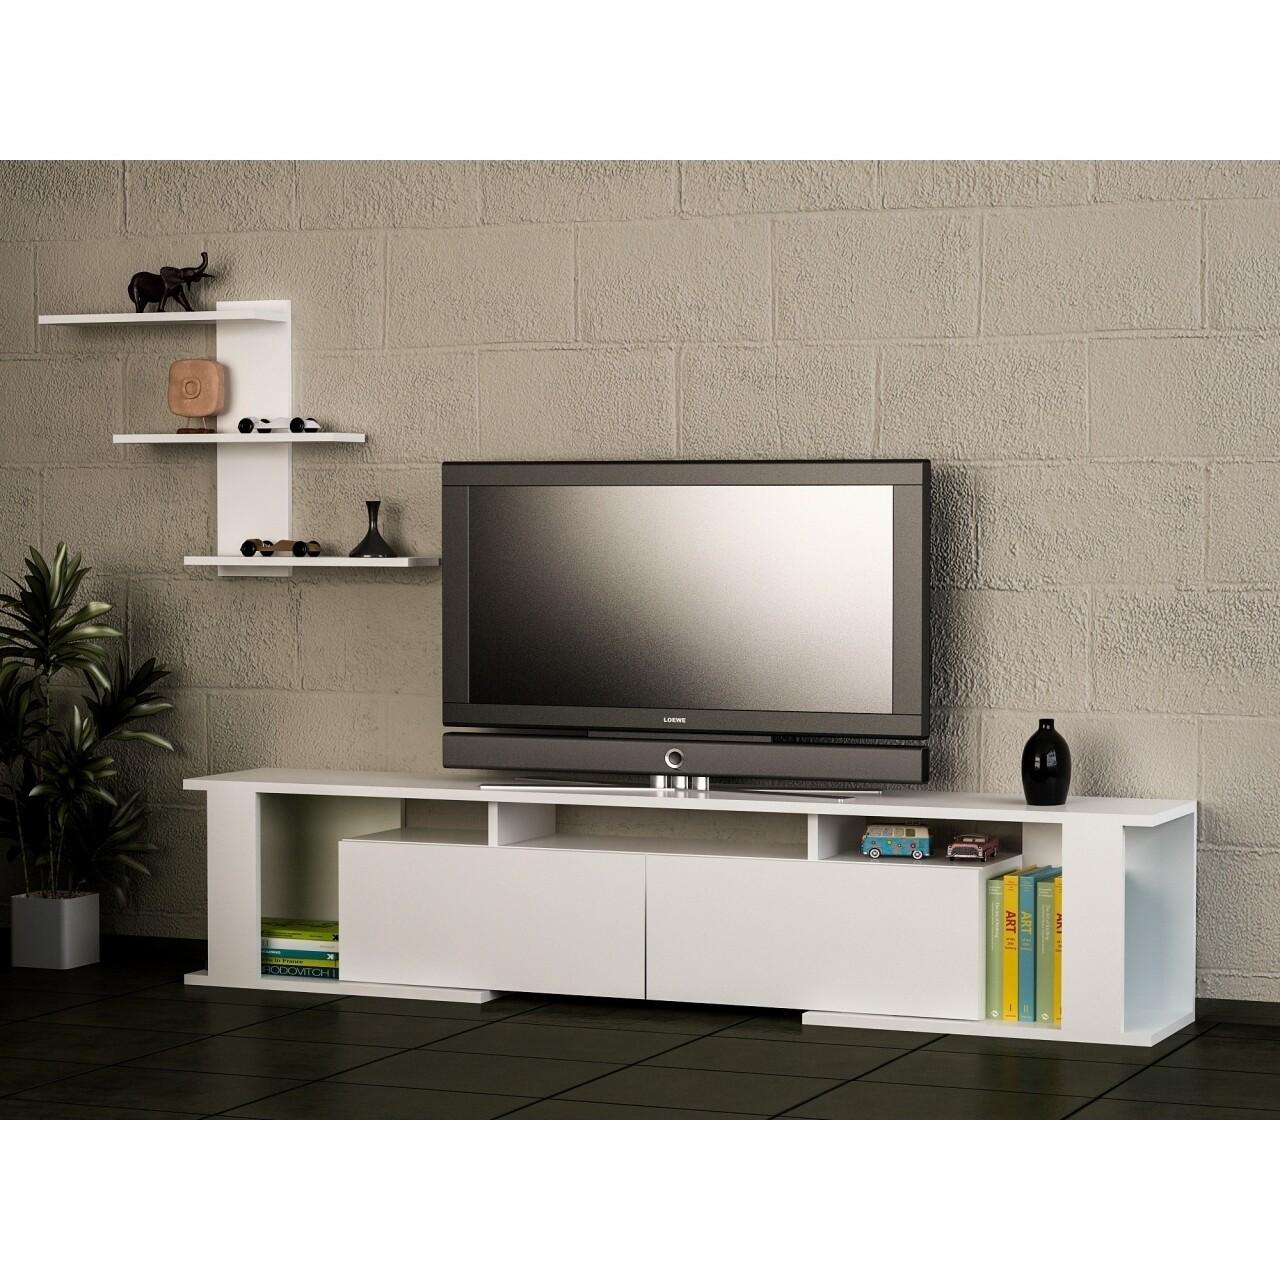 Comoda TV cu raft, Wooden Art, Game White, 180x29.6x36.8 cm